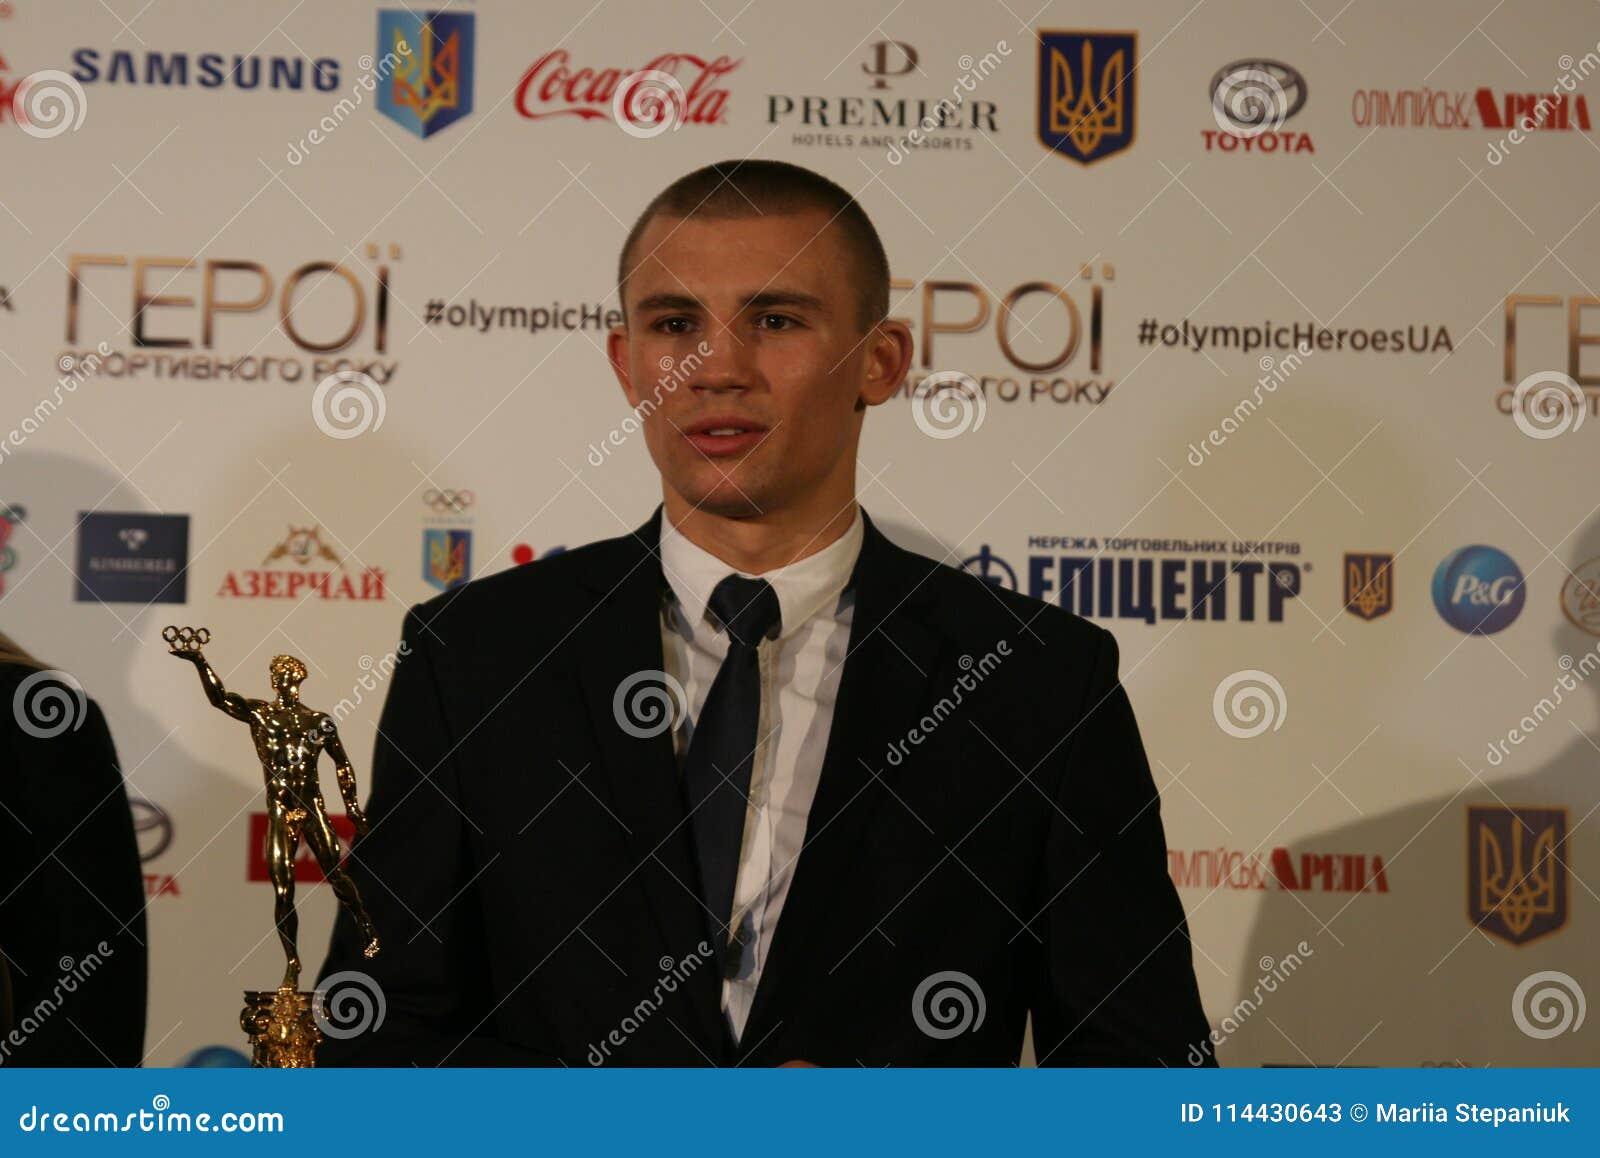 Oleksandr Khyzhniak na conferência de imprensa